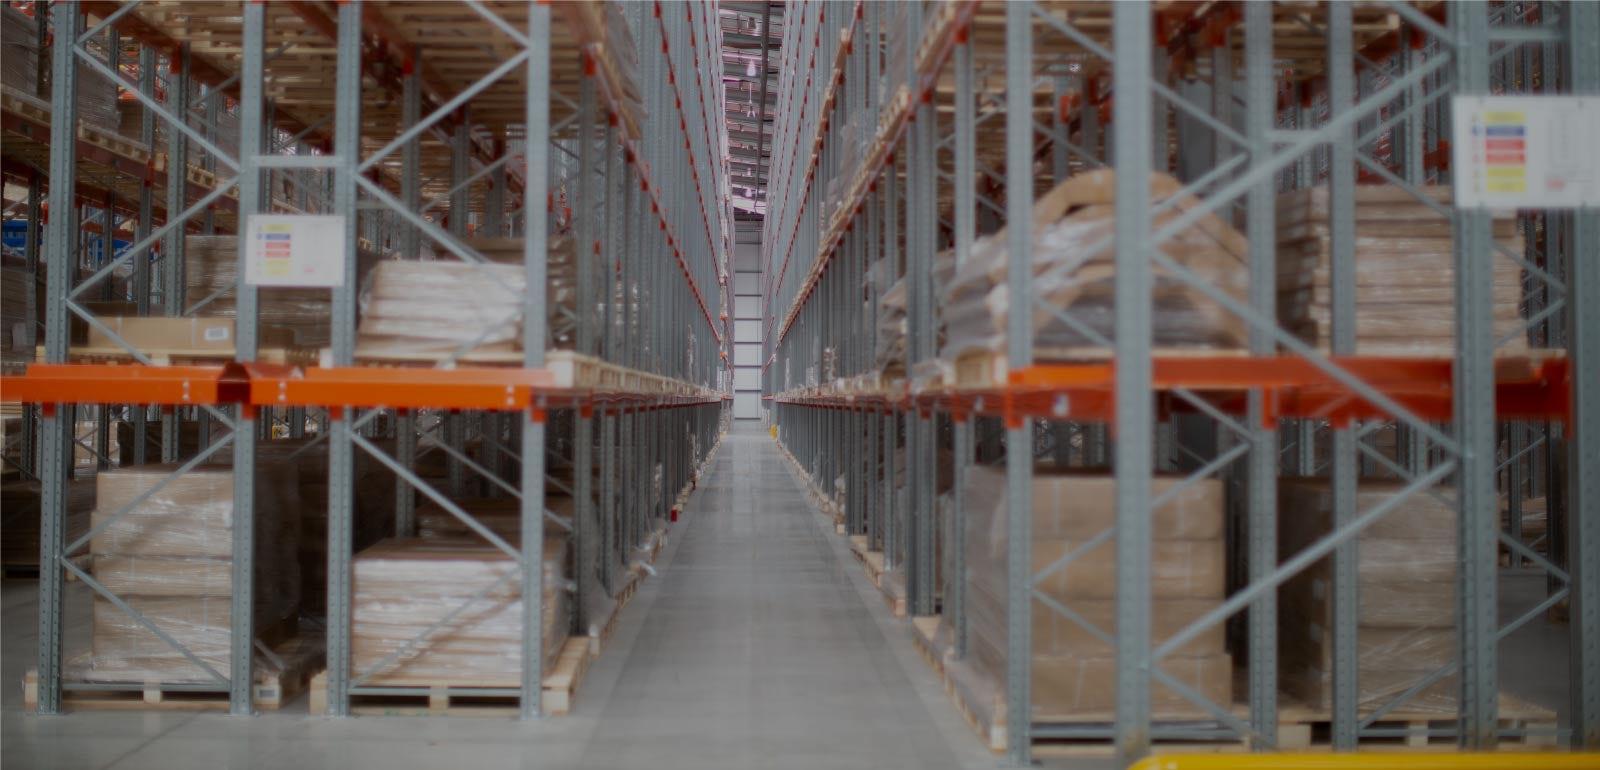 VictoriaPlum.com Distribution Centre wins International Safety Award with Merit